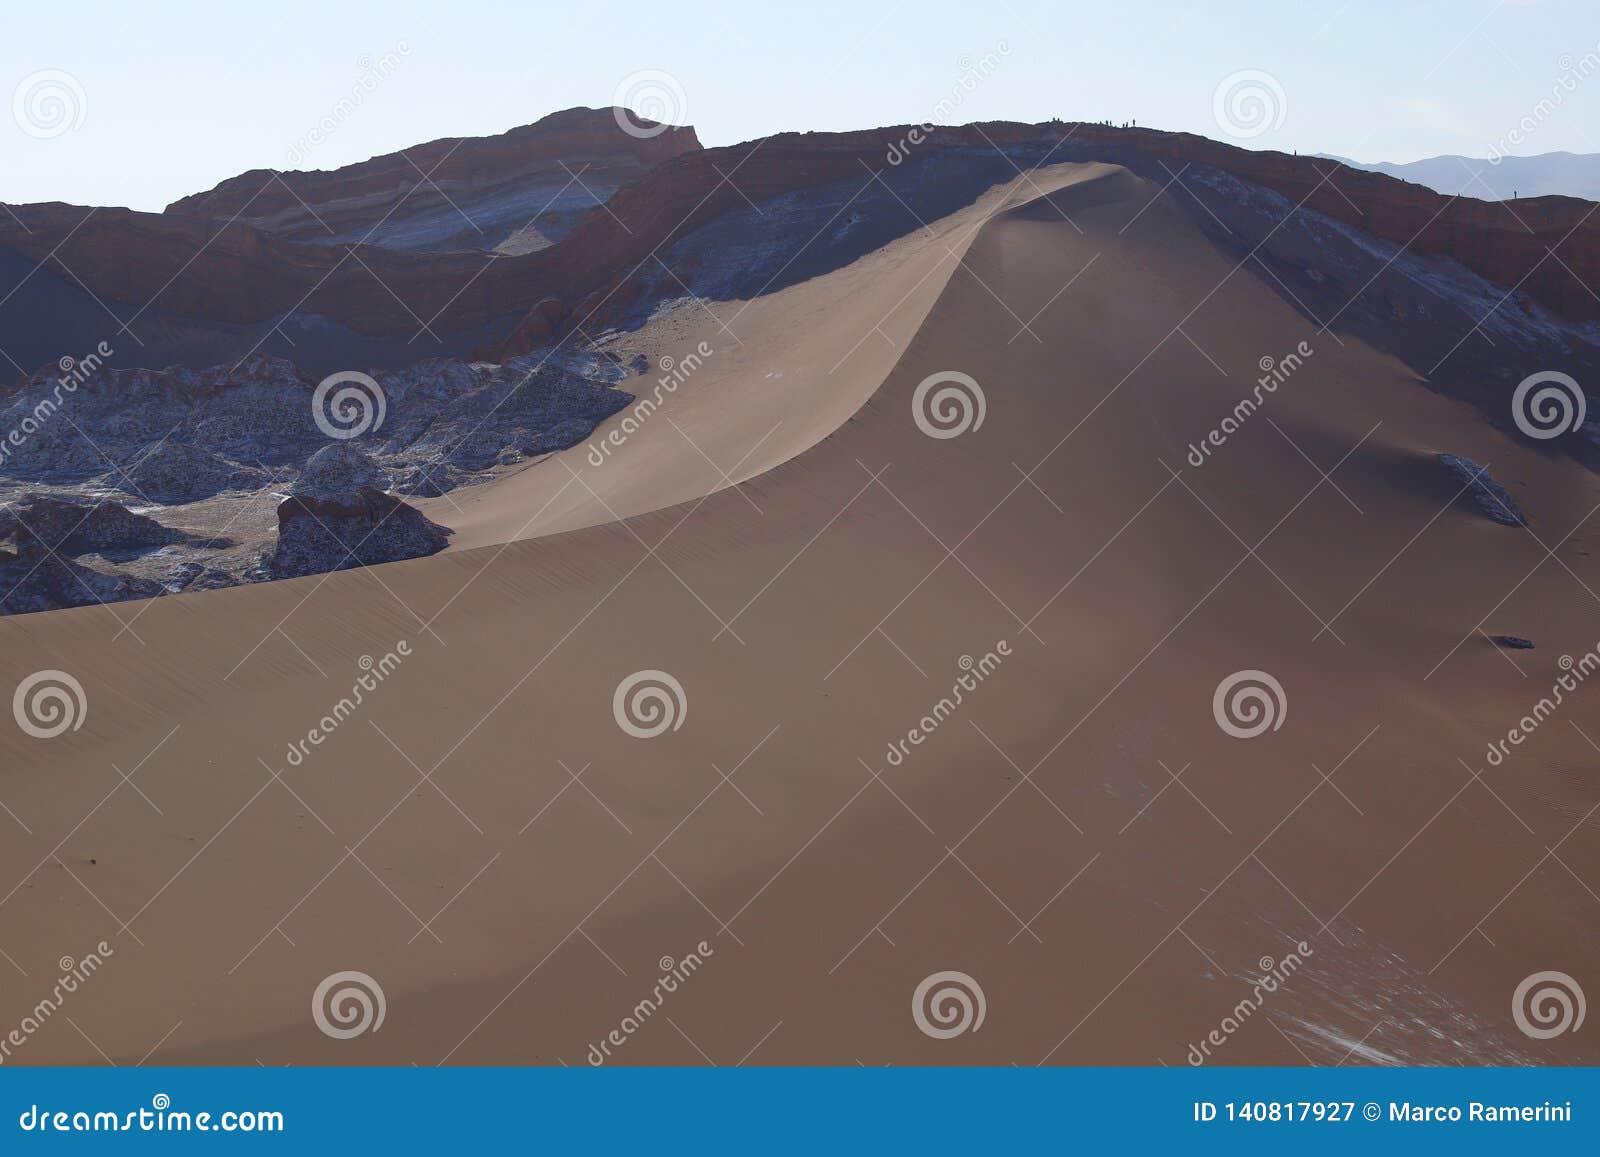 Valle de Λα Luna - κοιλάδα του φεγγαριού και των χιονισμένων ηφαιστείων, έρημος Atacama, Χιλή